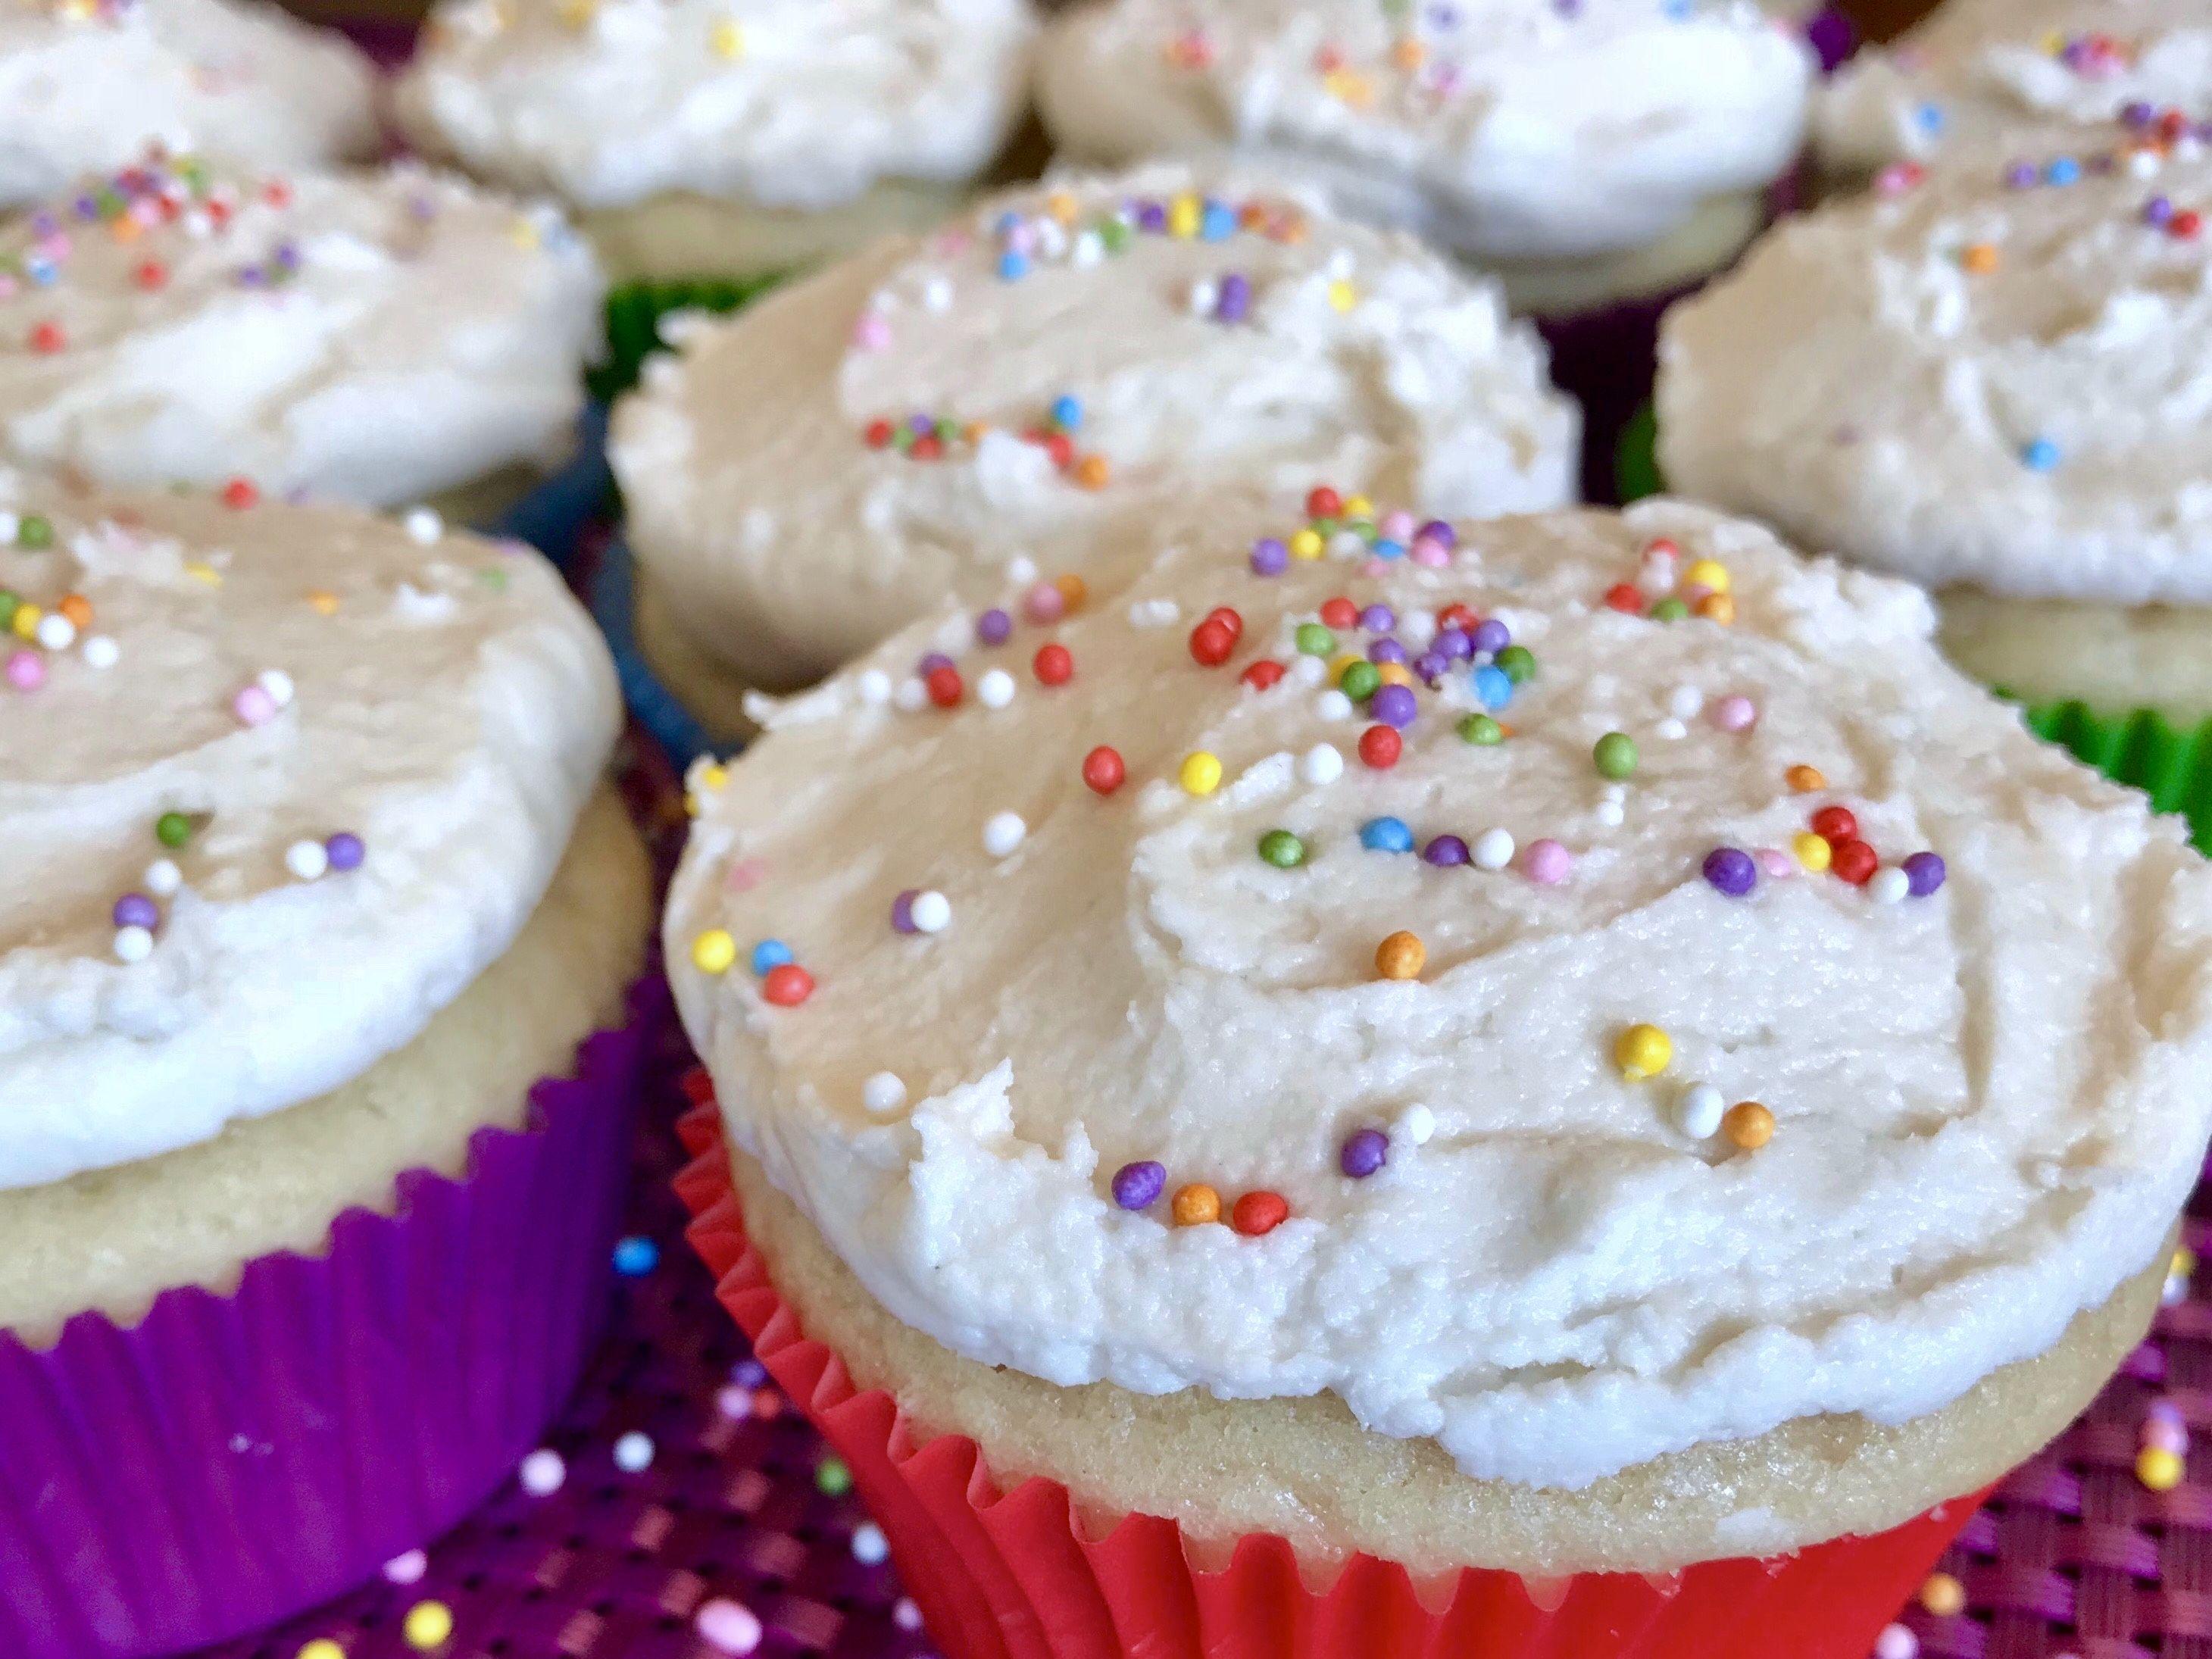 Perfectly Vanilla Vegan Cupcakes (with Gluten Free Option)